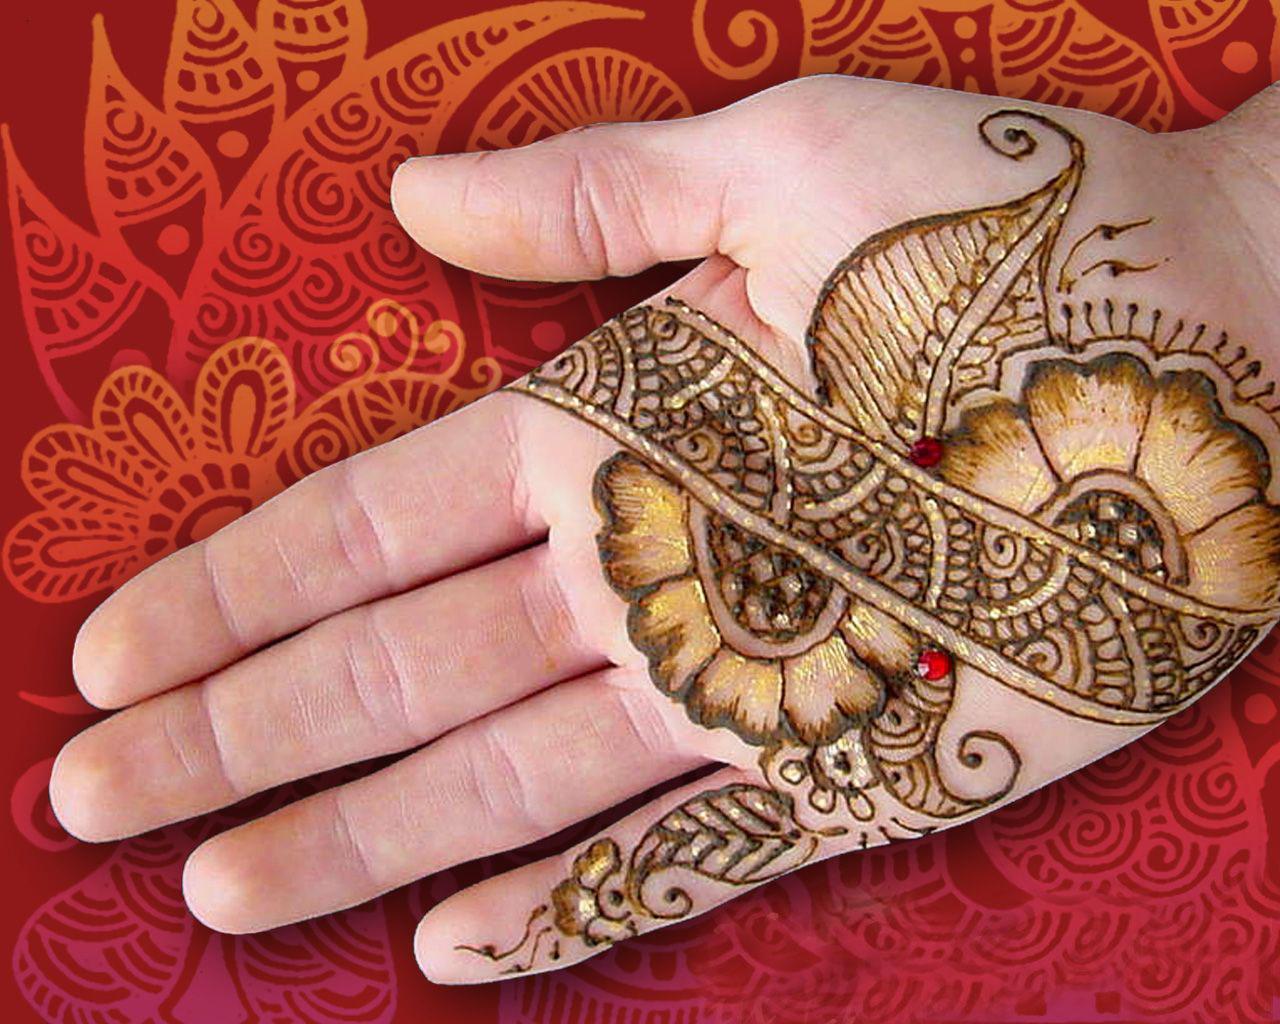 Latest Mehndi Designs For Eid 2010-11: 15 New Henna Styles